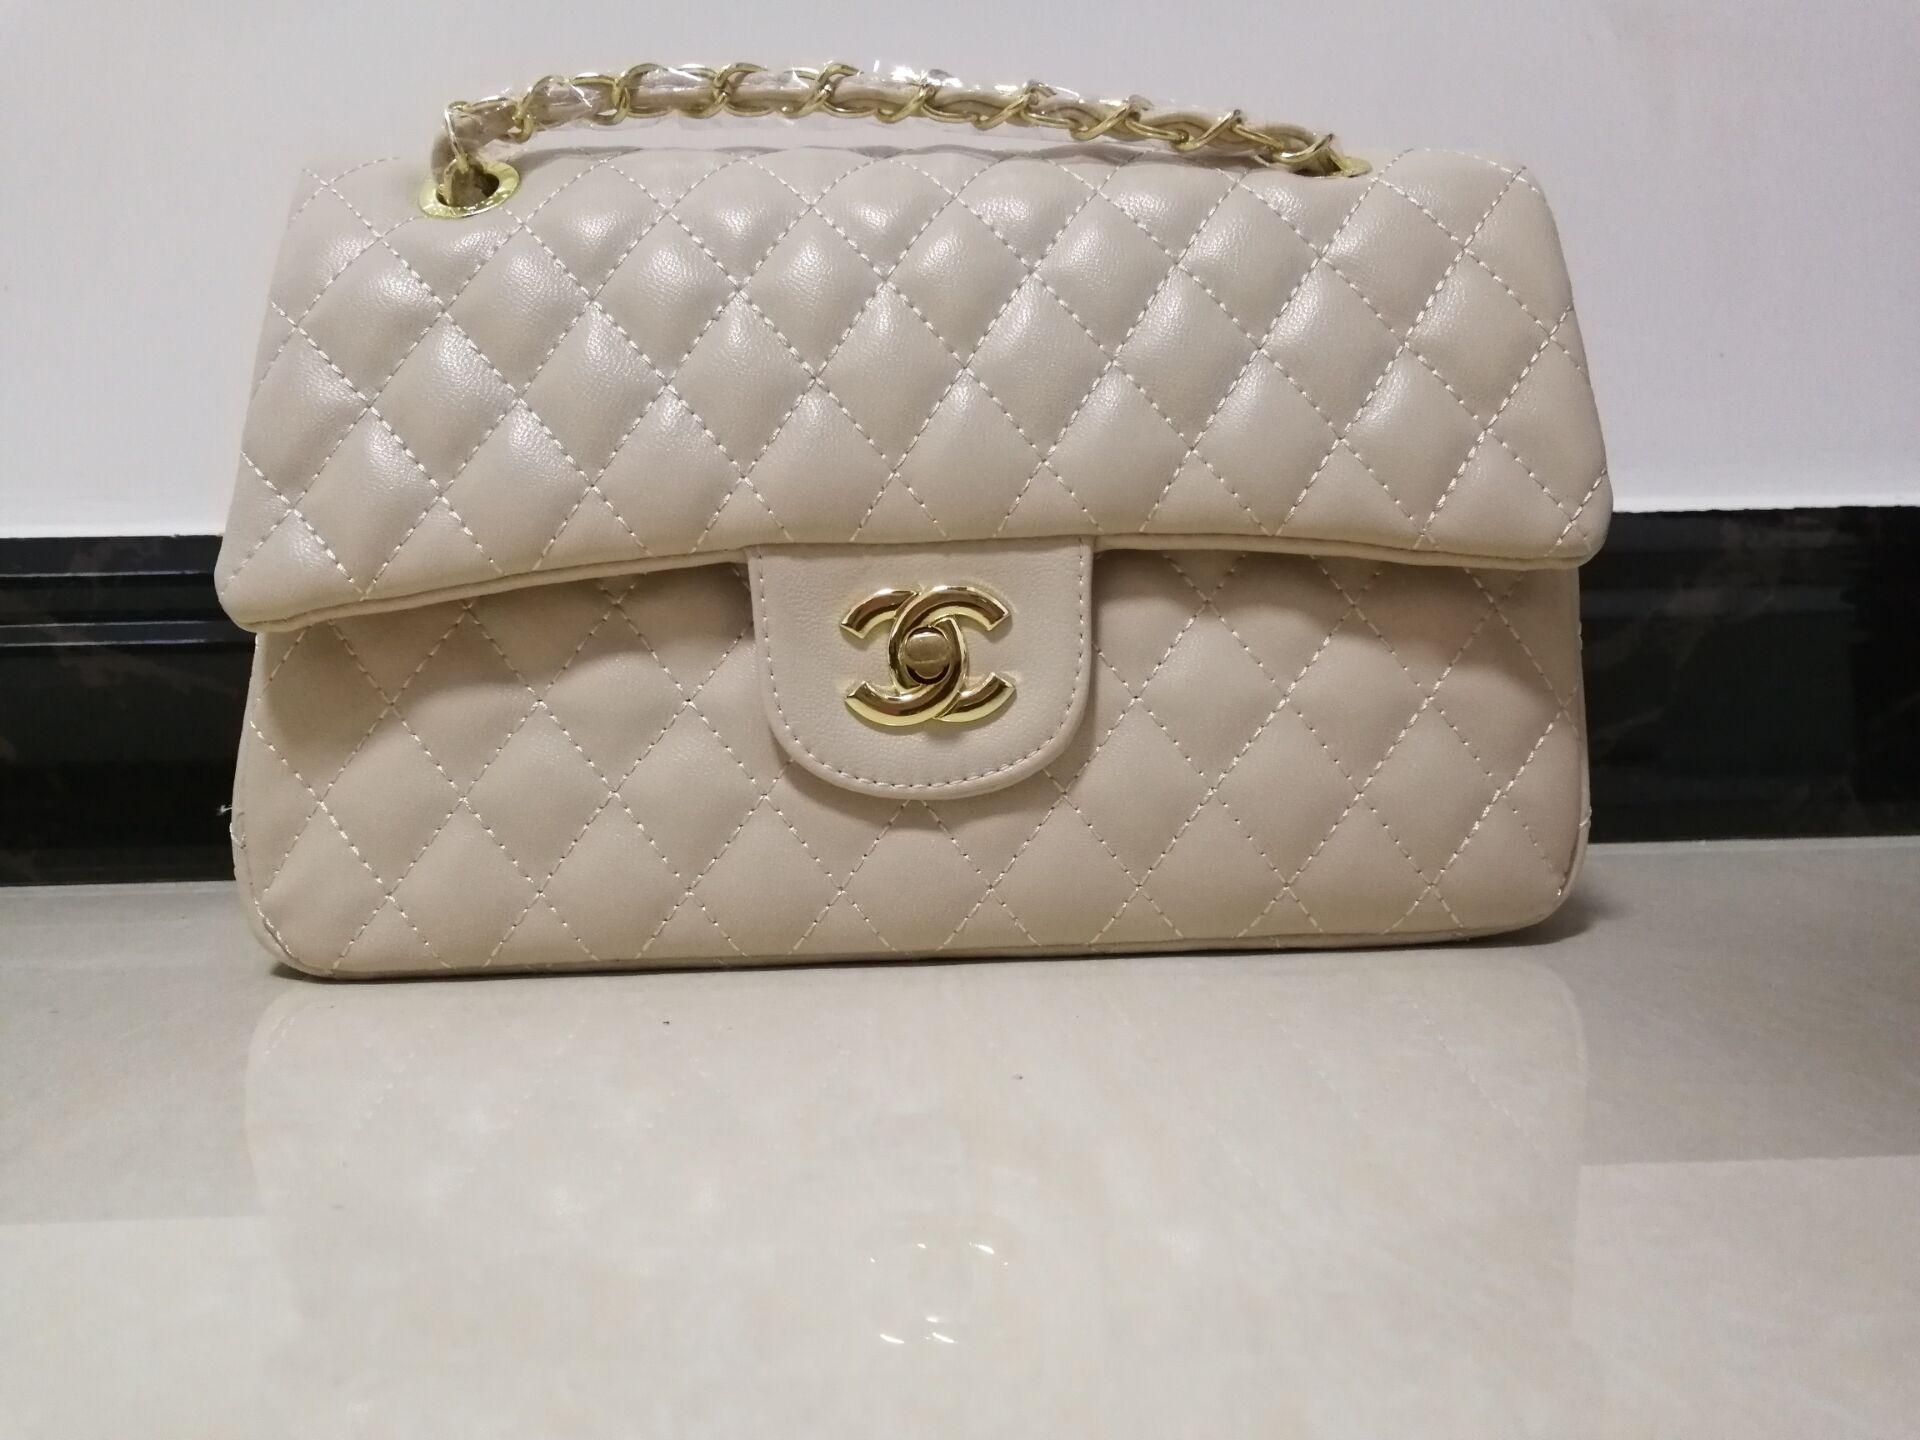 2e97a5515473 2018 Women Leather Handbag Designer Handbags Shoulder Bag Designer Luxury Handbags  Purses Hot Sale Fashion Vintage Handbags Online with  29.8 Piece on ...